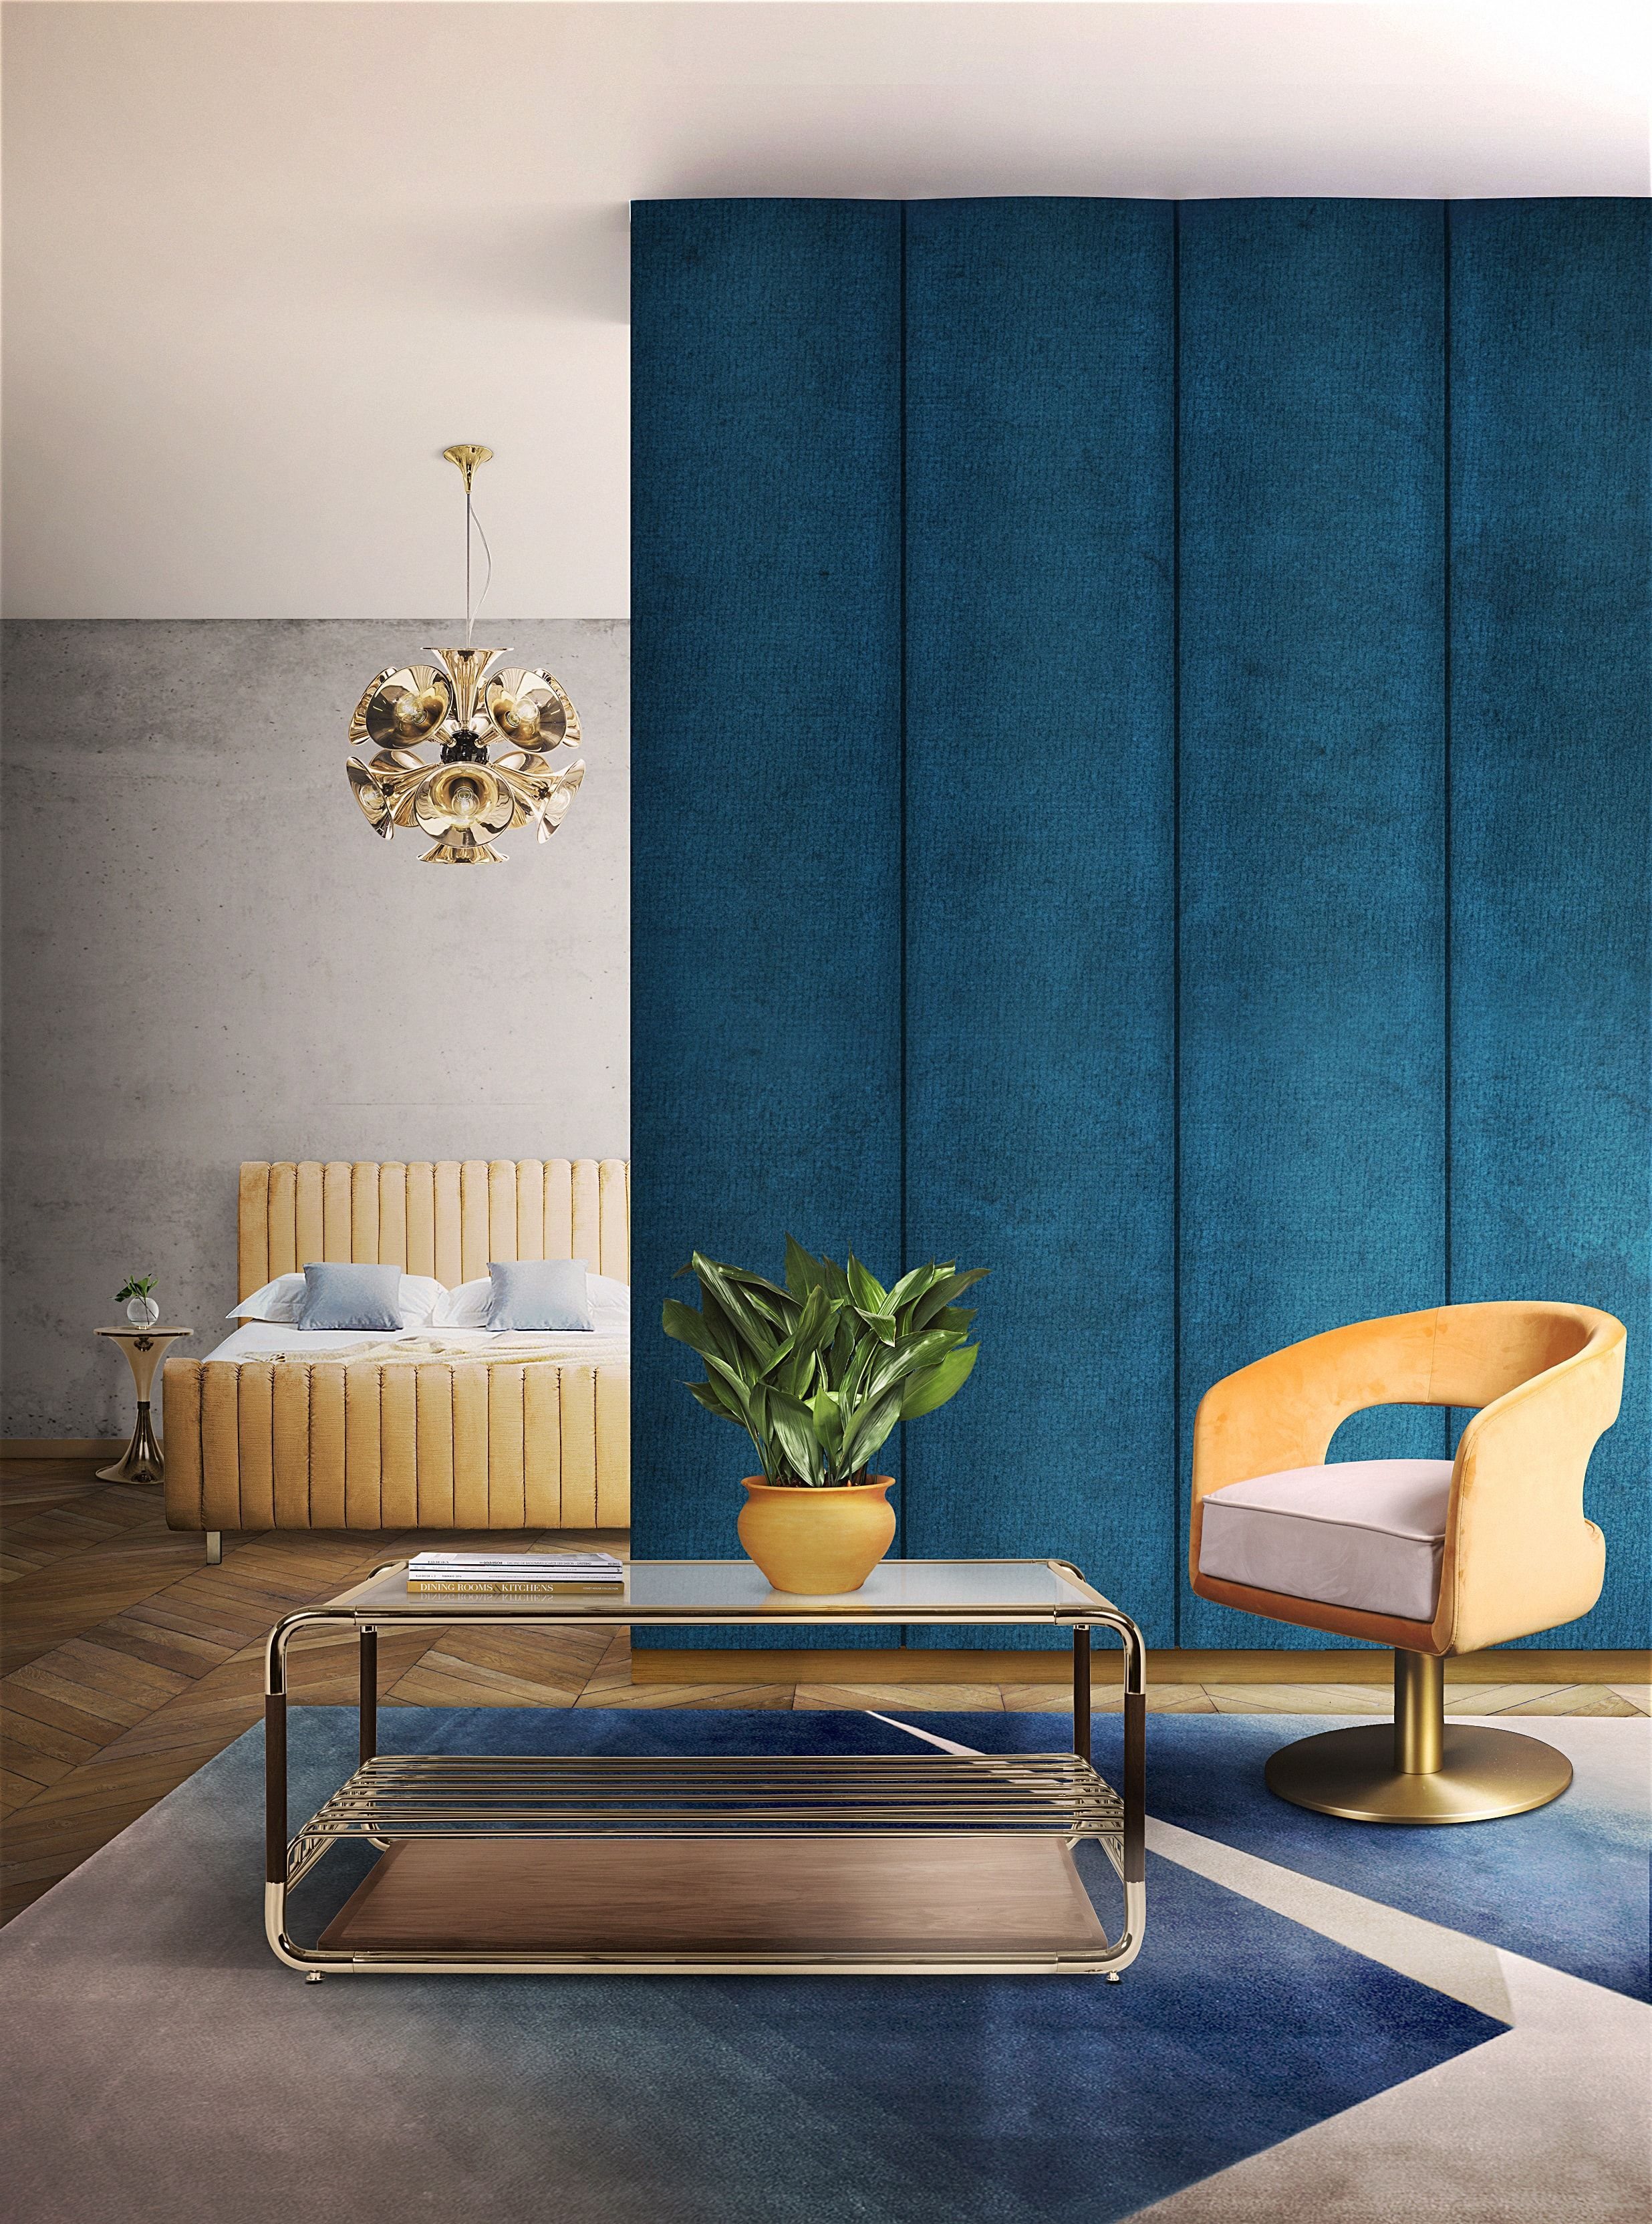 products of decor interior design home decor inspiration design rh pinterest com